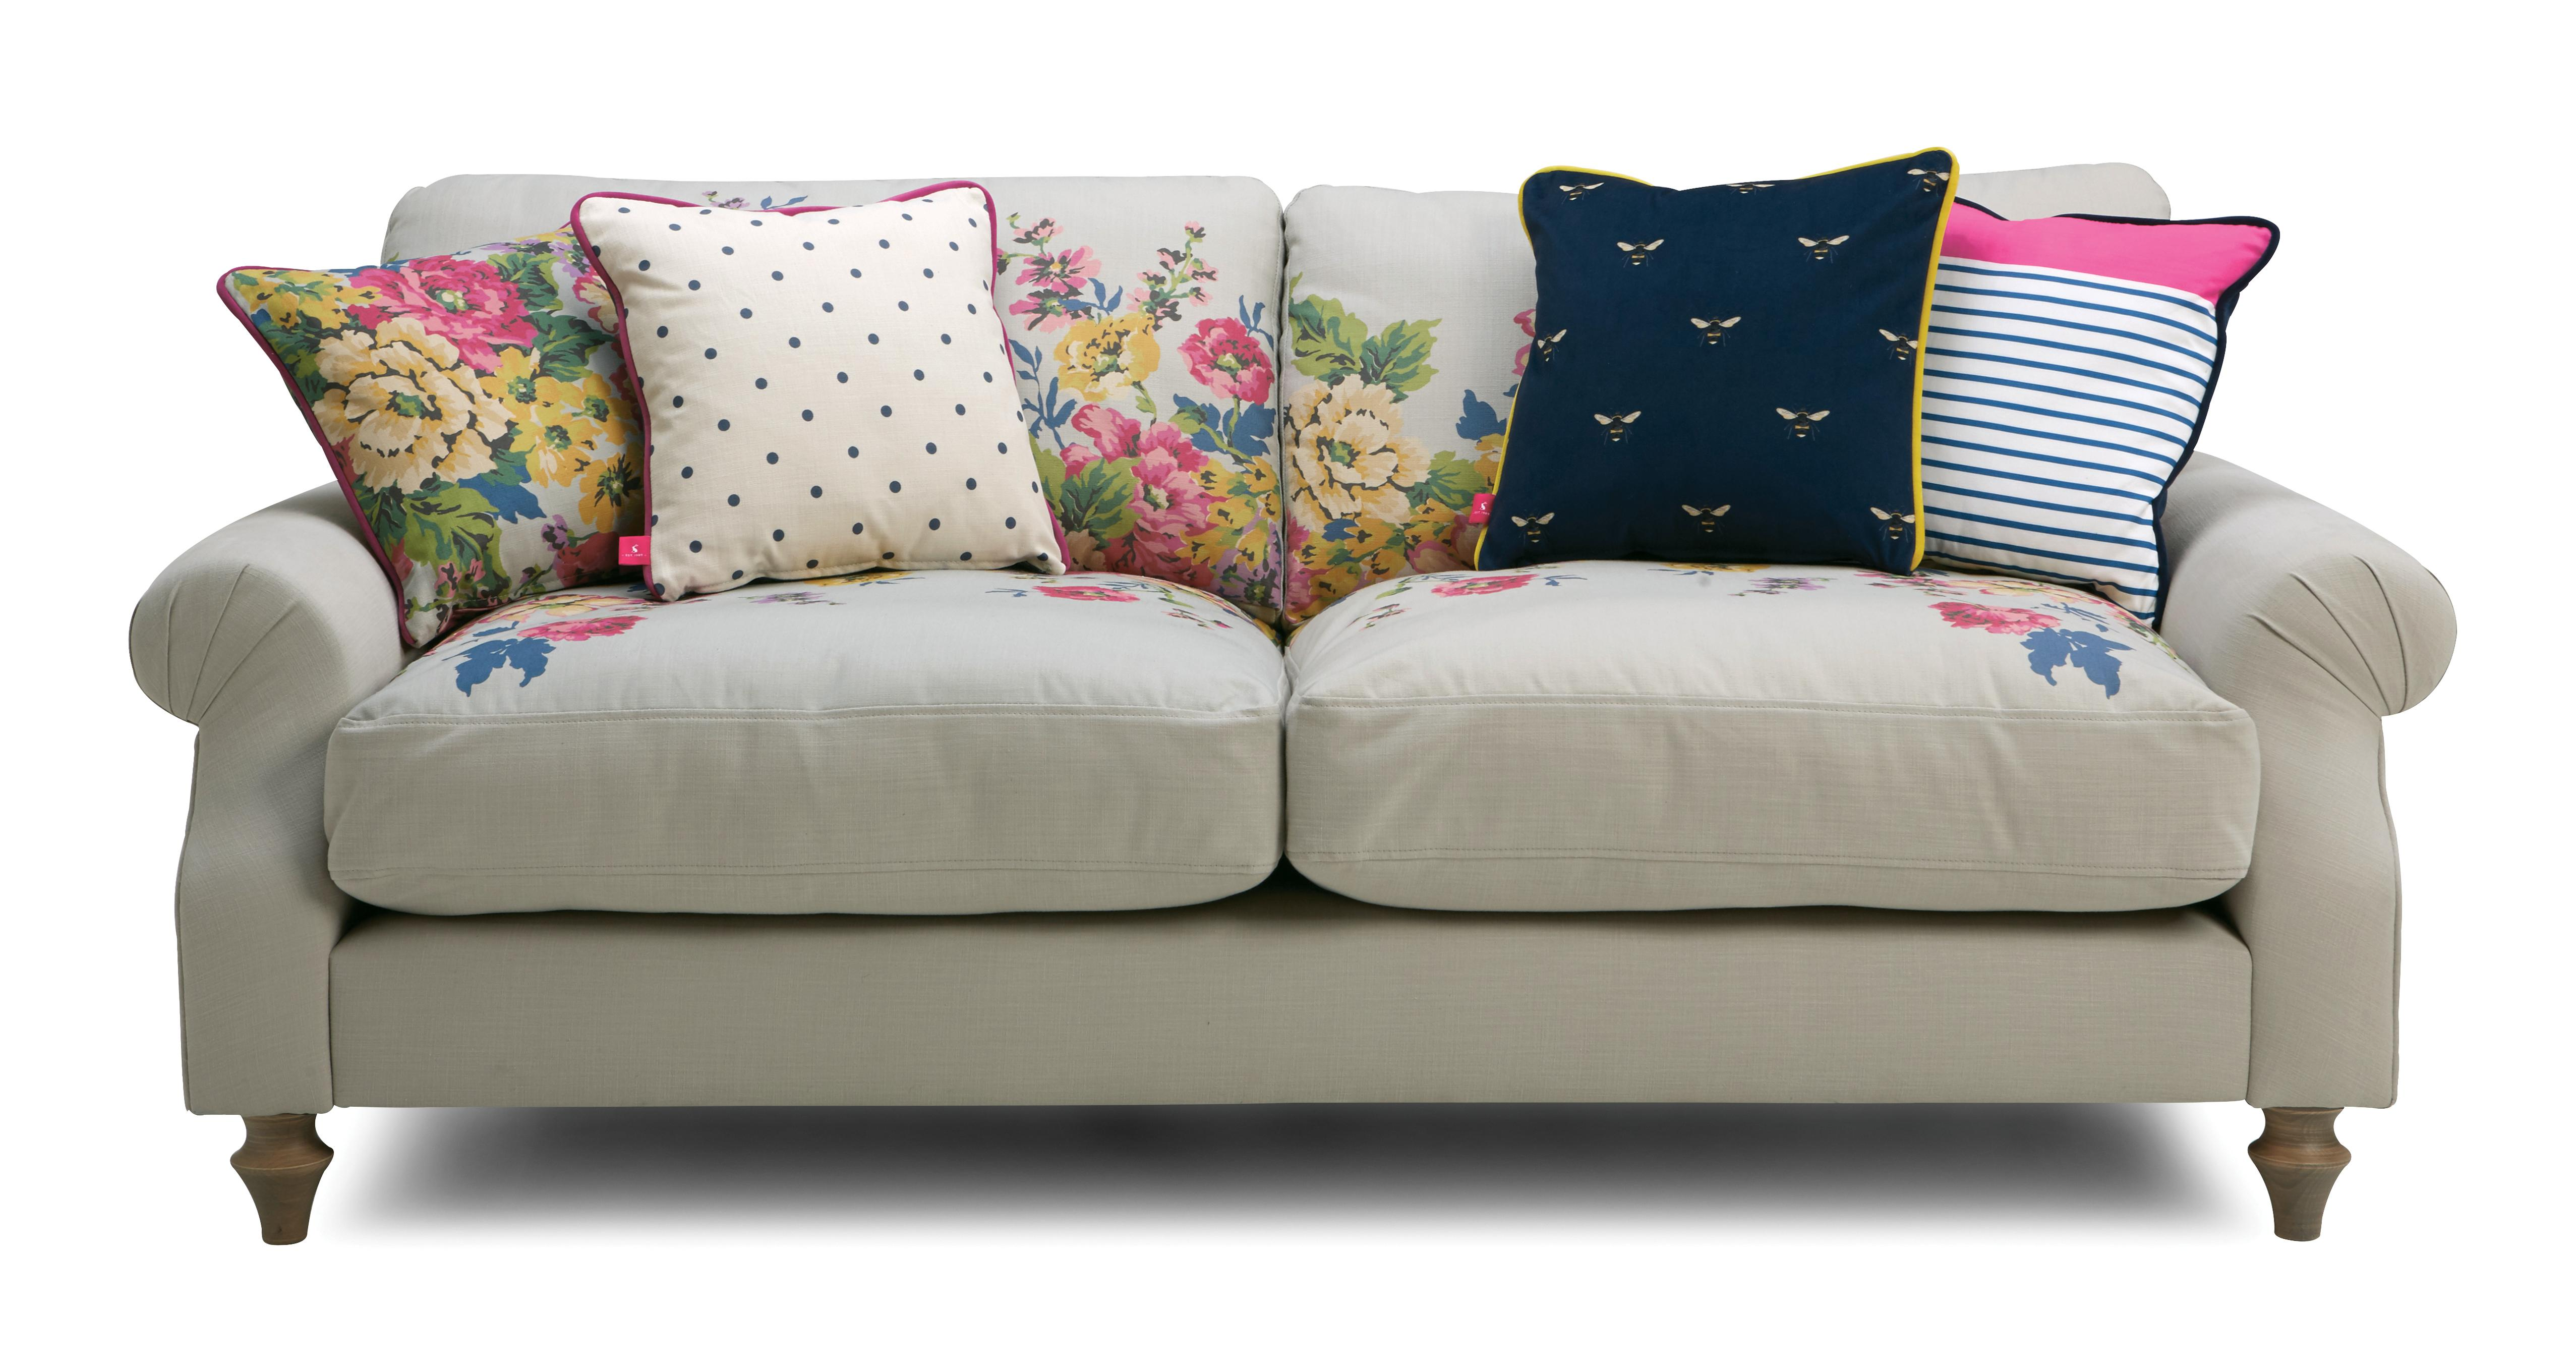 dfs cambridge sofa reviews minneapolis cotton 3 seater plain and floral